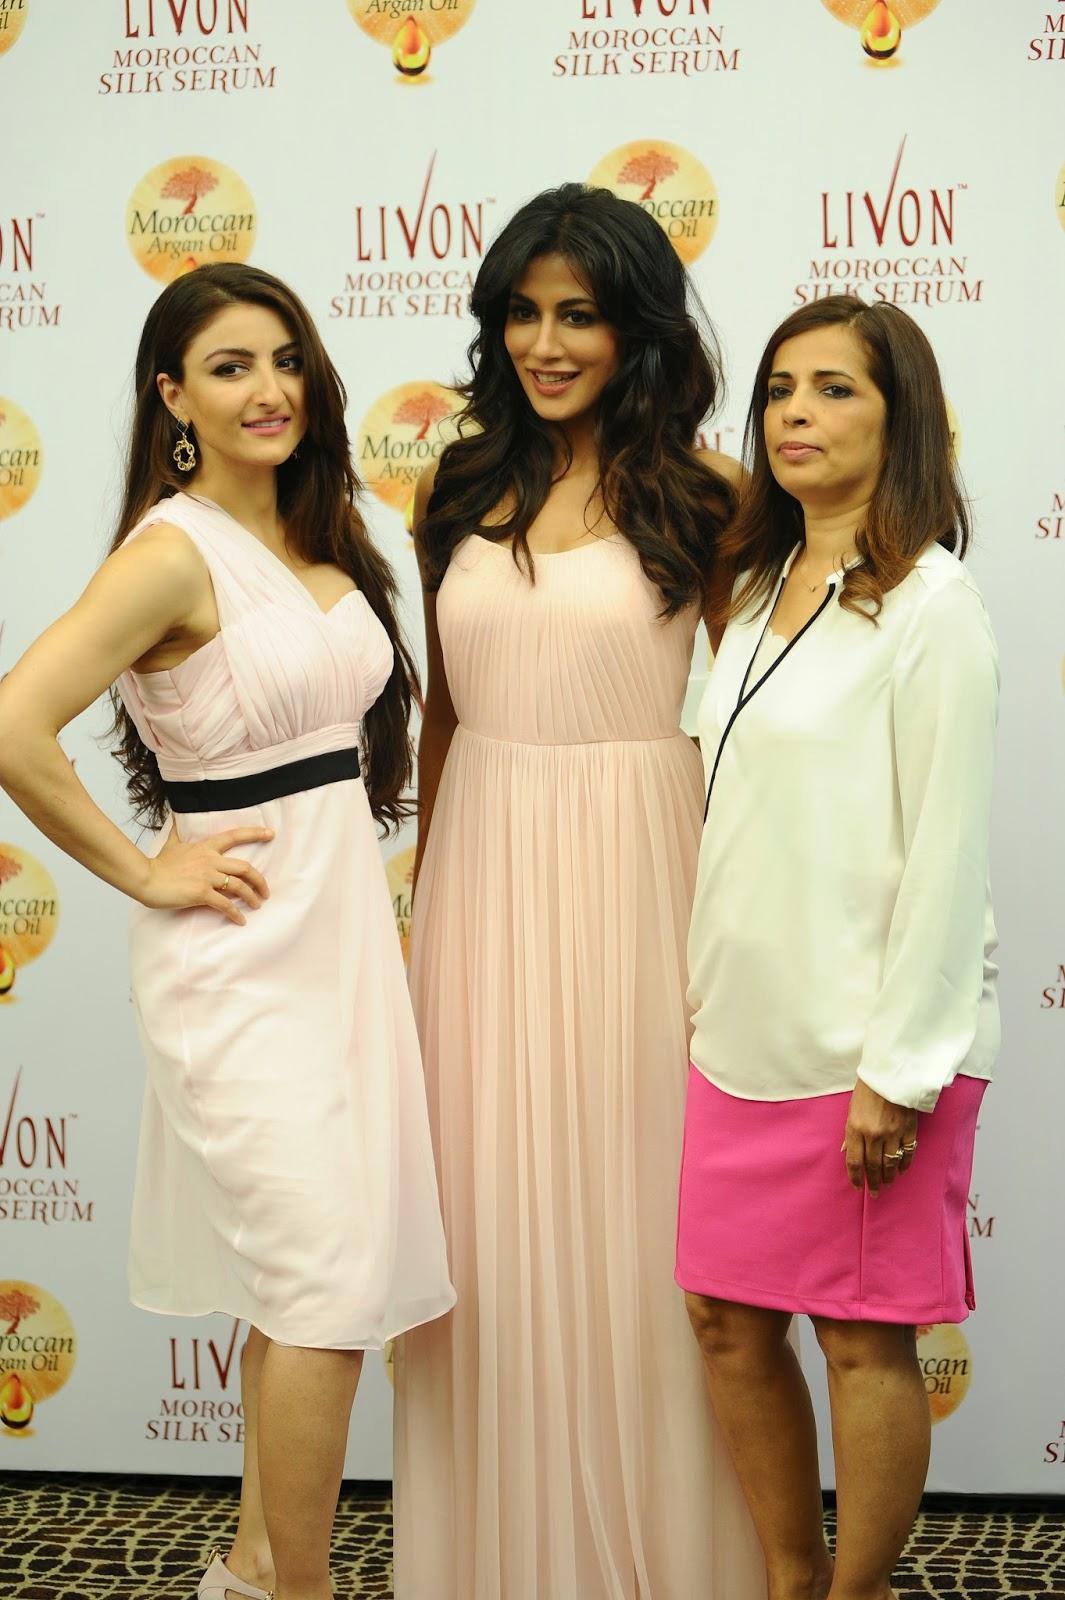 Livon Moroccan Silk Serum - Launch By Chitrangda Singh and Soha Ali Khan